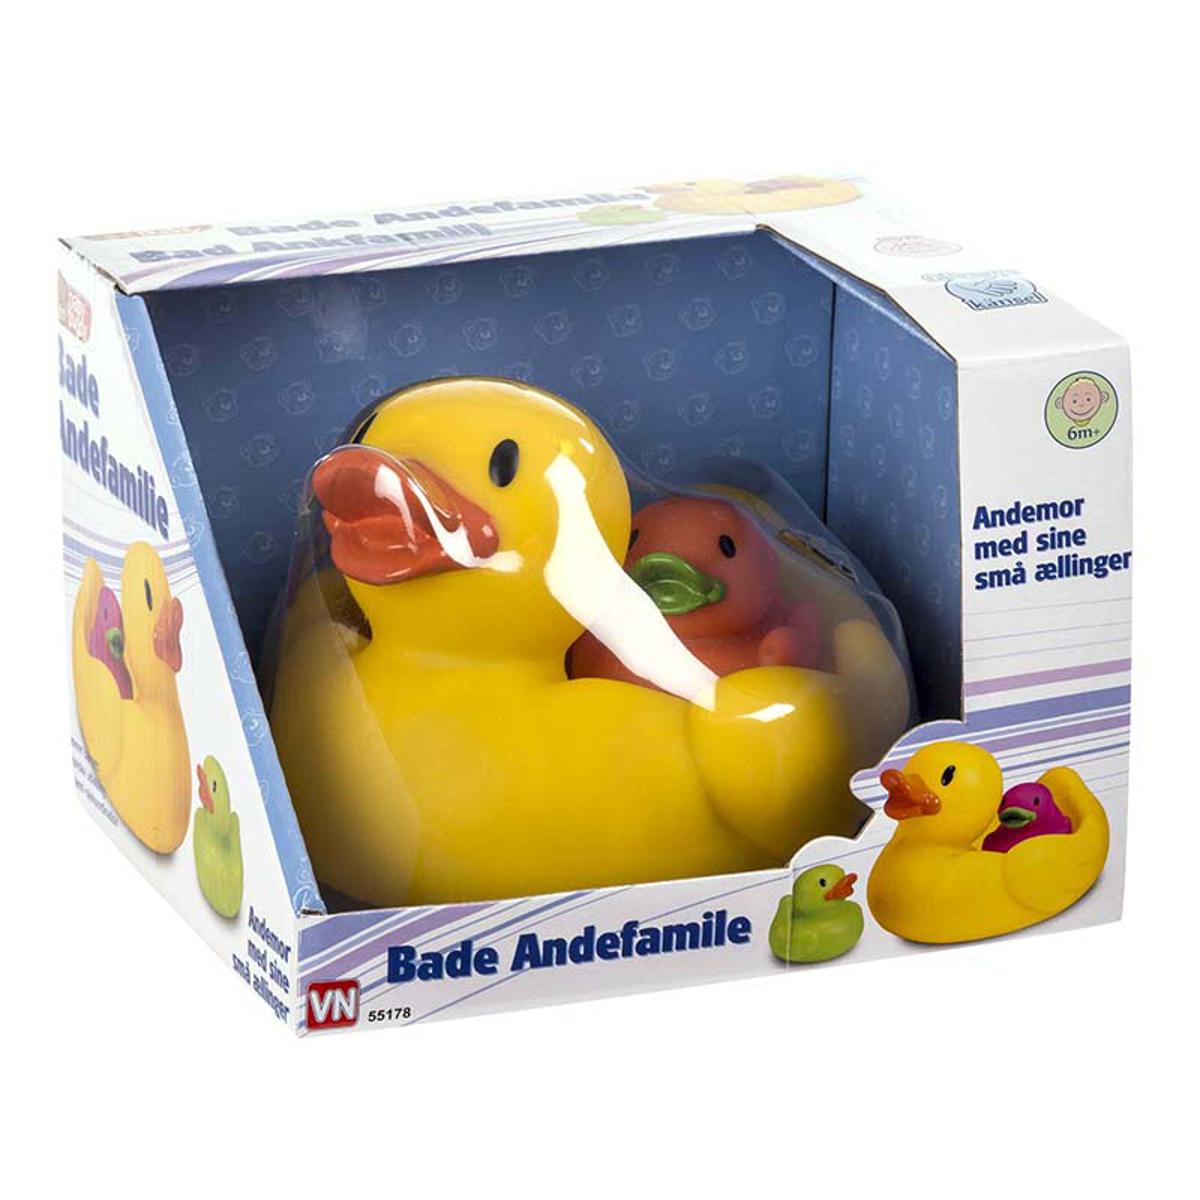 Baby Buddy bade andefamilie